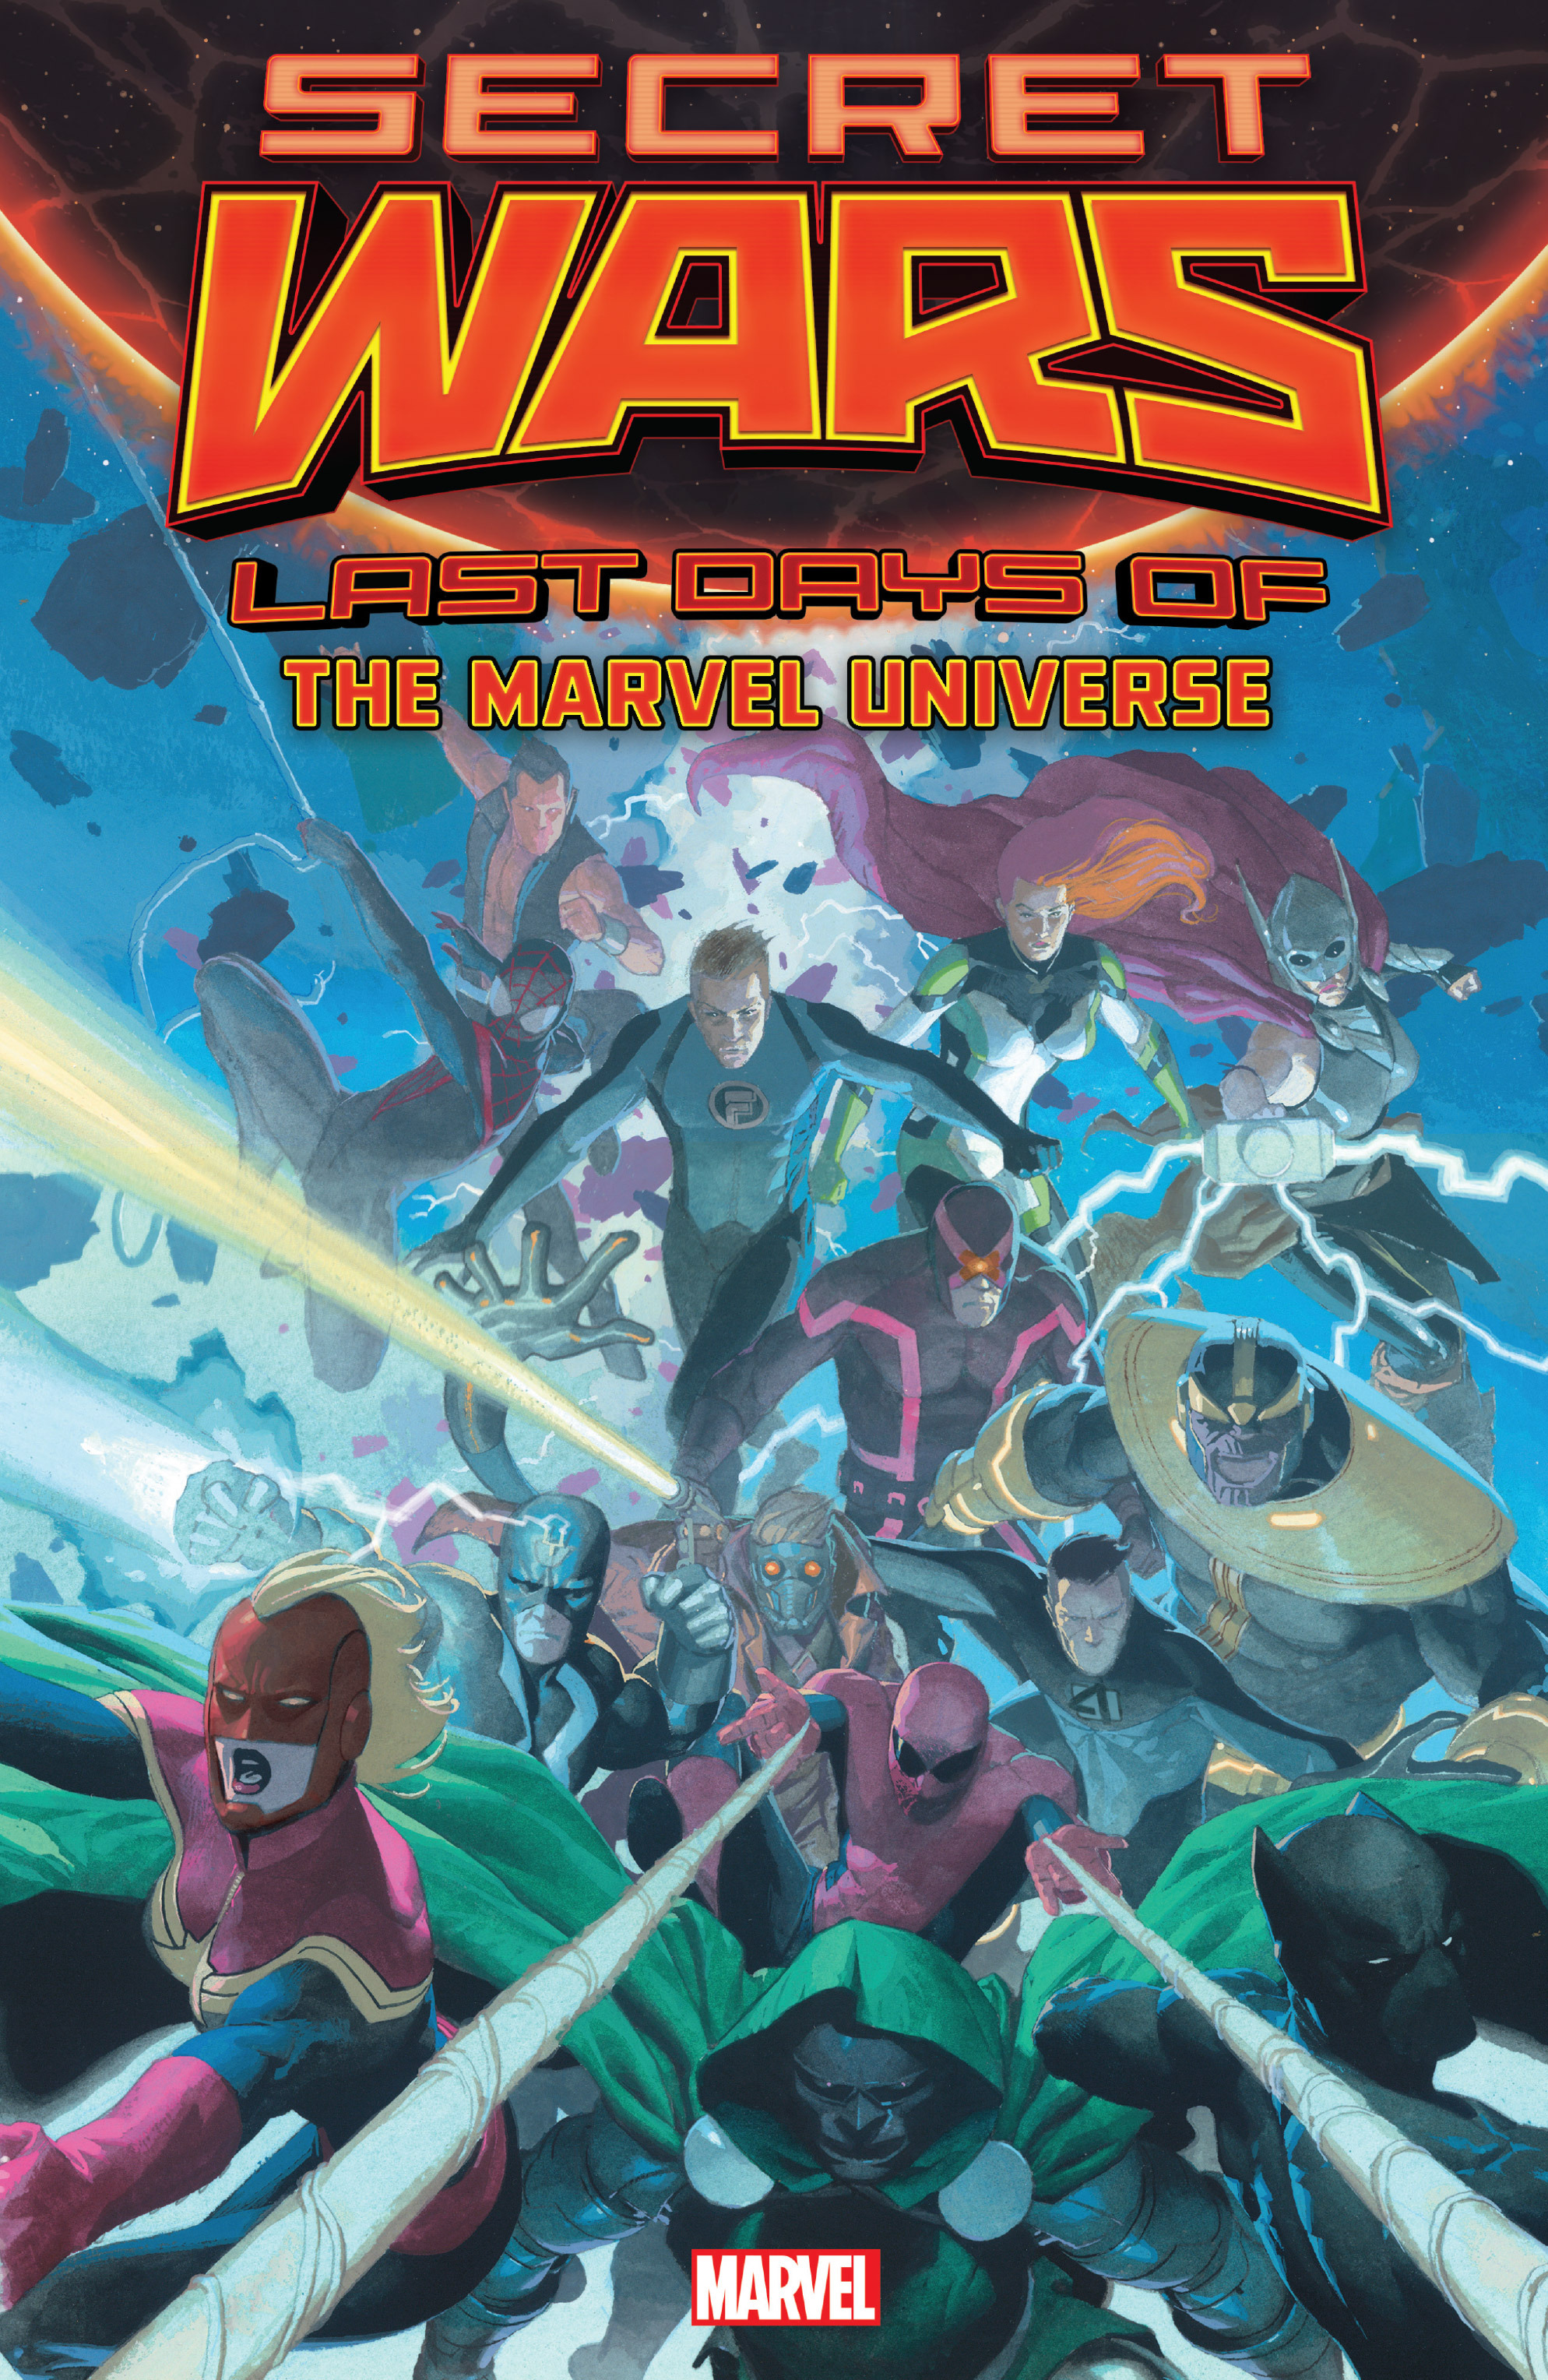 Read online Secret Wars: Last Days of the Marvel Universe comic -  Issue # TPB (Part 1) - 1